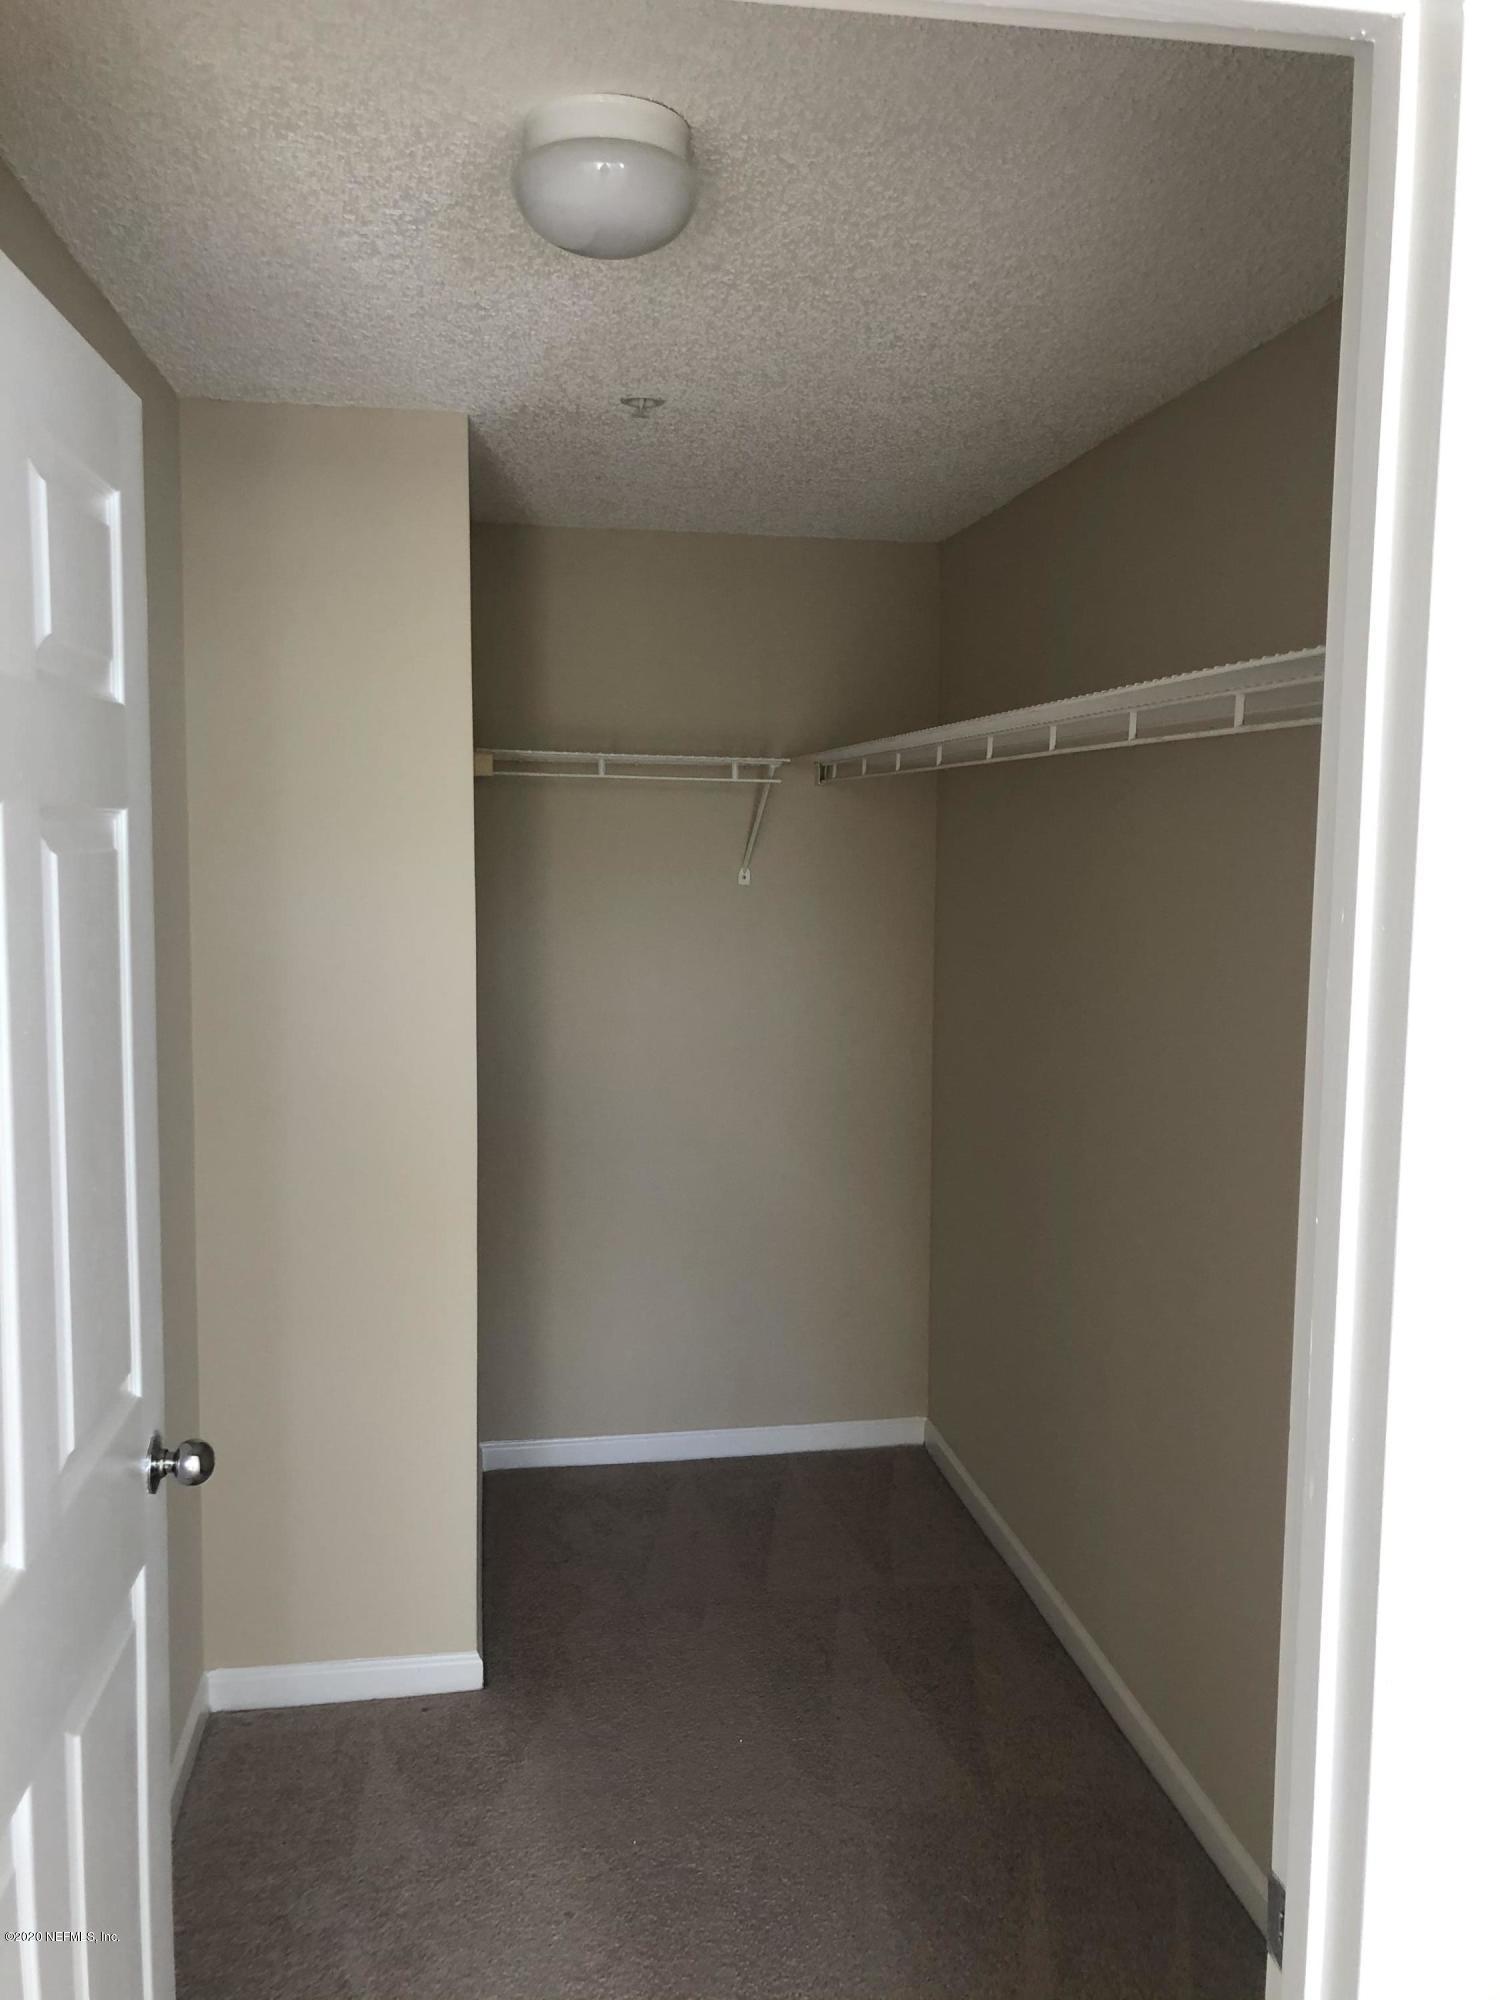 4000 GRANDE VISTA, ST AUGUSTINE, FLORIDA 32084, 2 Bedrooms Bedrooms, ,2 BathroomsBathrooms,Residential,For sale,GRANDE VISTA,1079934